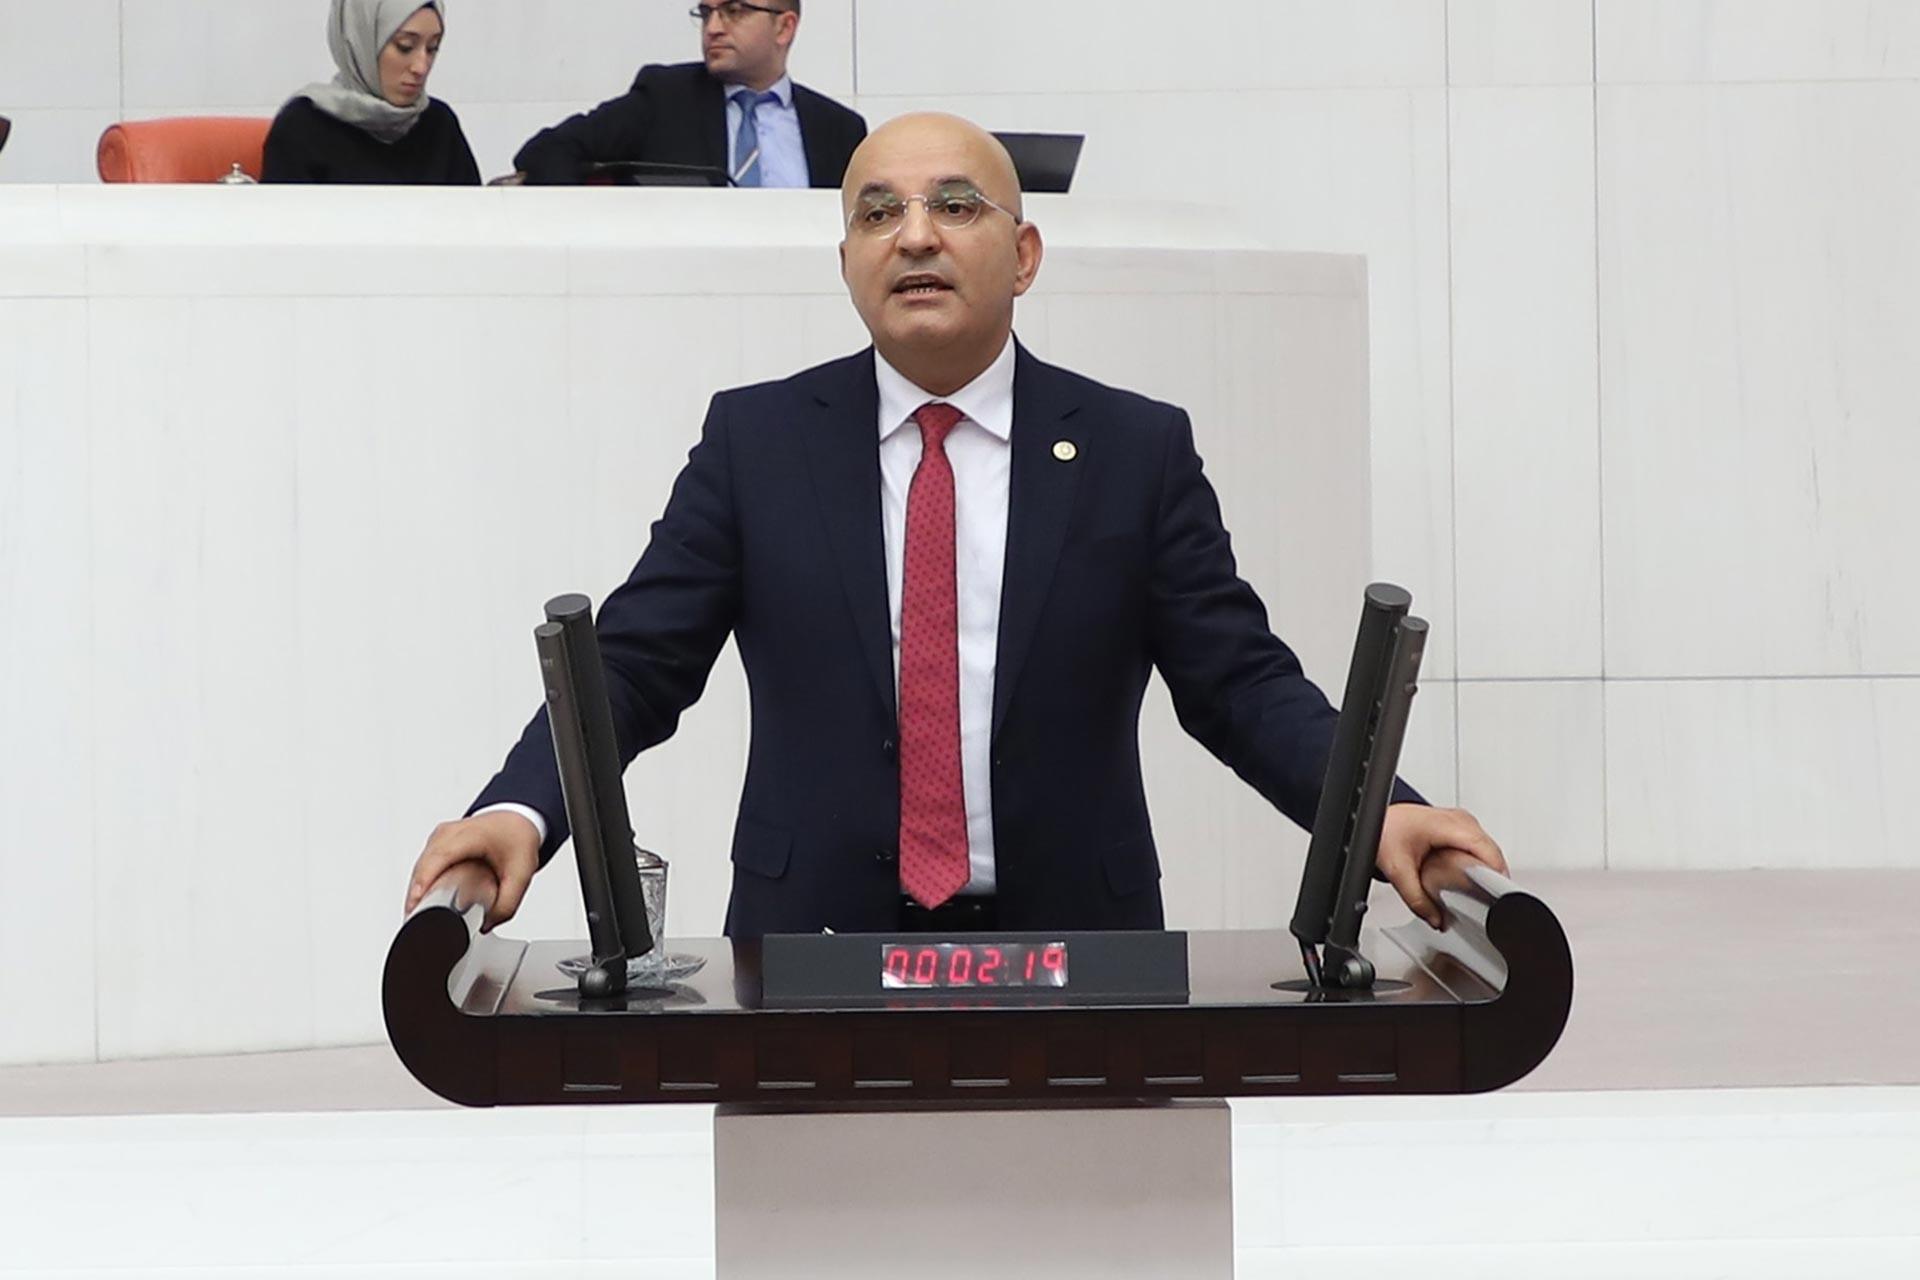 CHP Milletvekili Mahir Polat, Meclis kürsüsünde konuşurken